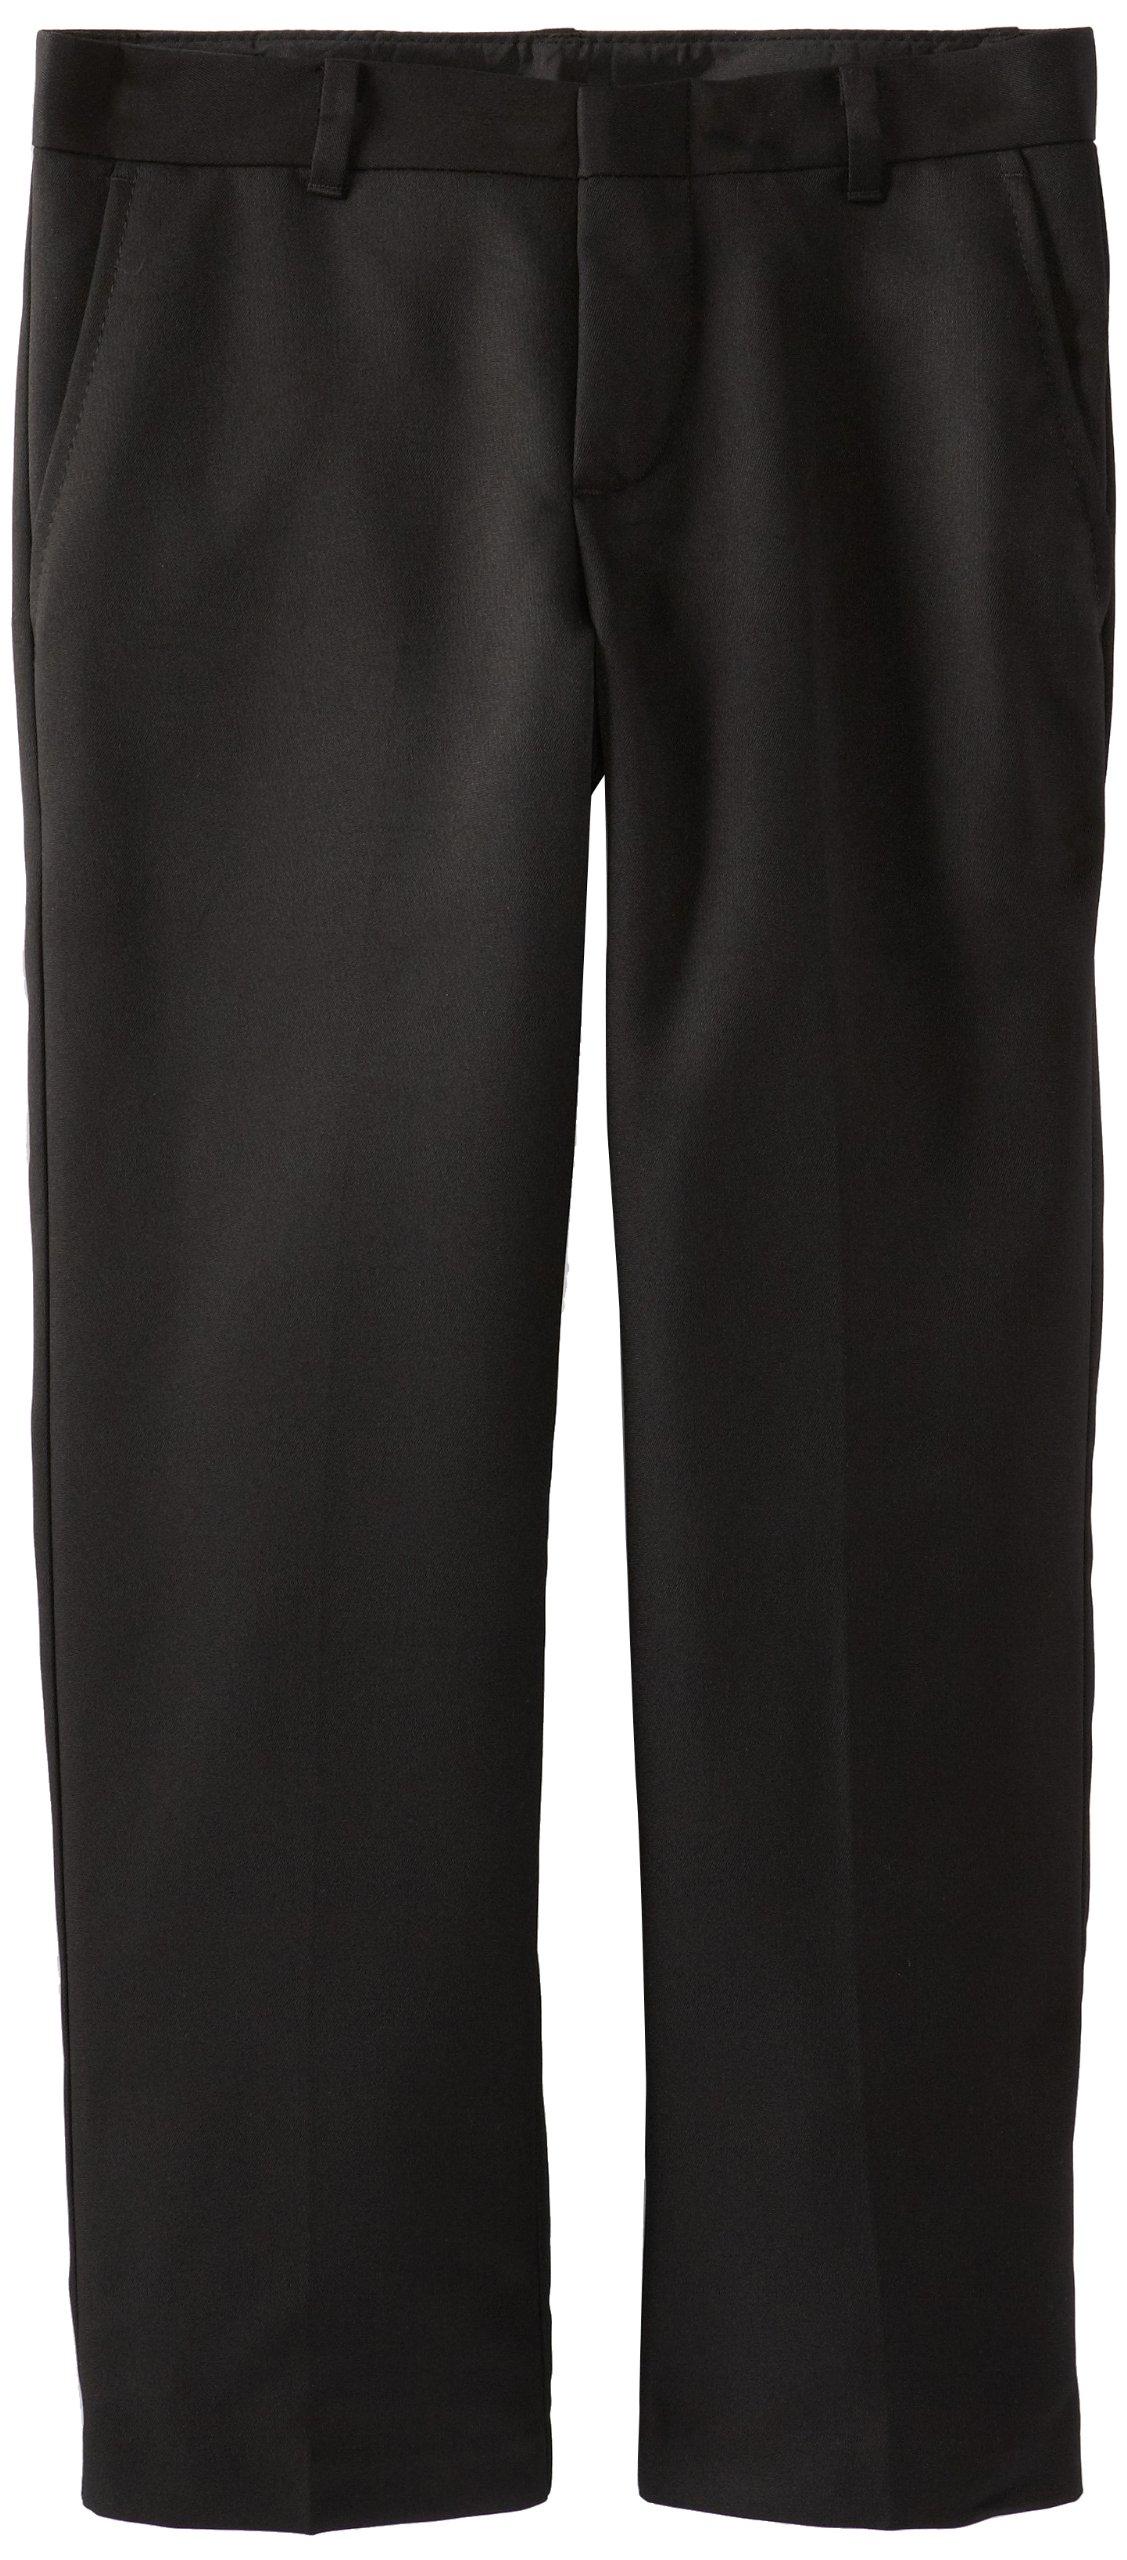 IZOD Big Boys' Micro Fiber Pant, Black, 18